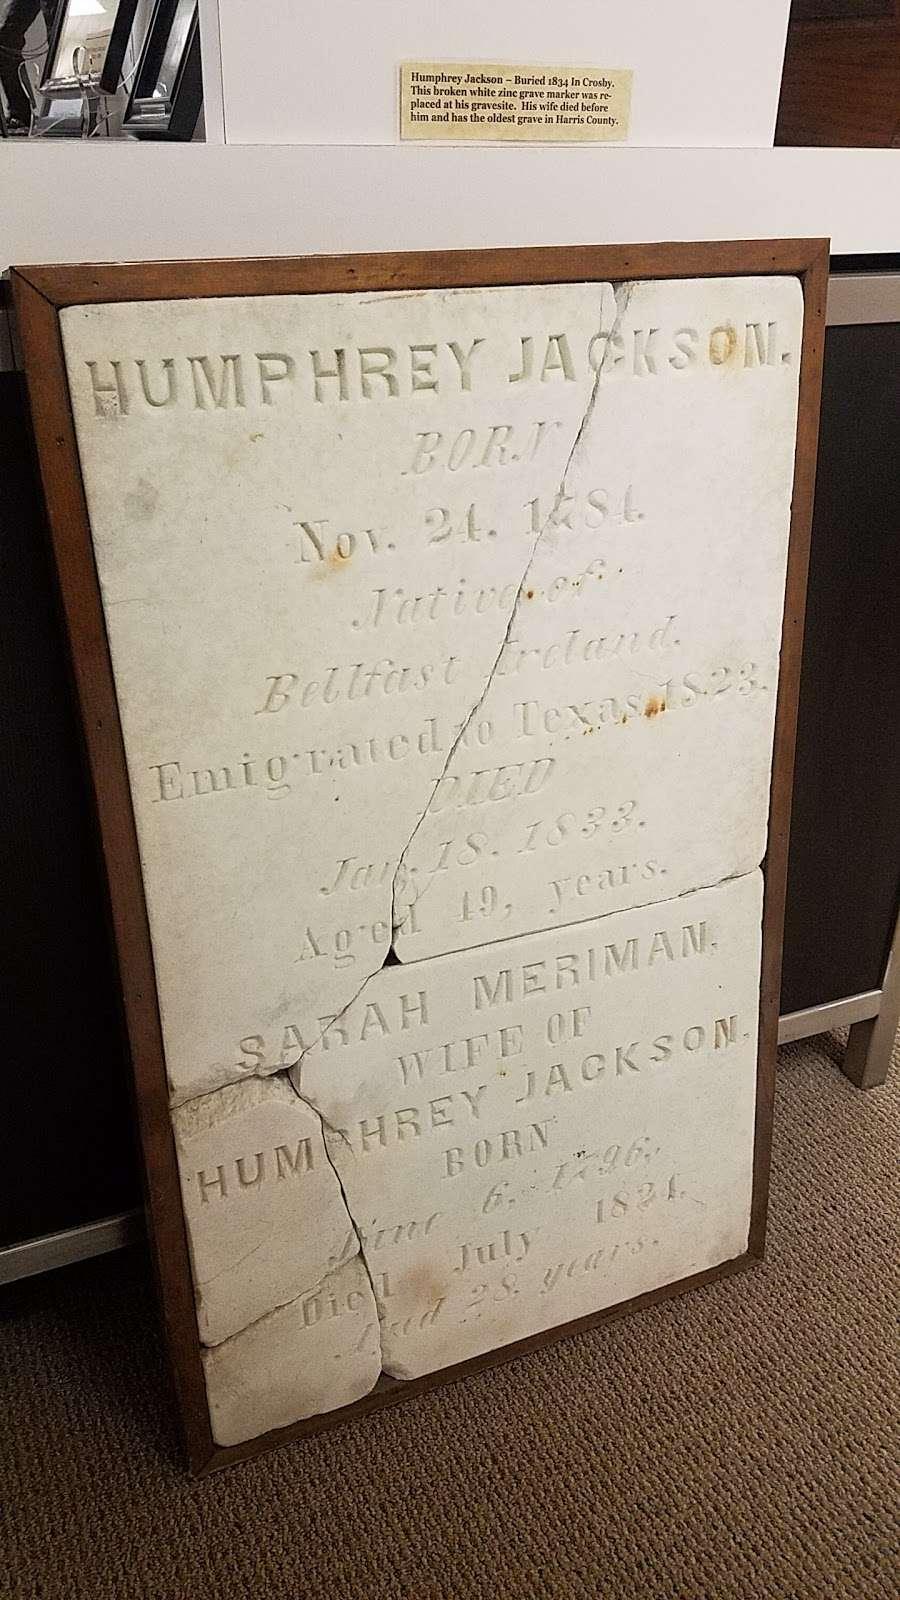 Chambers County Museum at Wallisville - museum  | Photo 8 of 10 | Address: 20136 I-10, Wallisville, TX 77597, USA | Phone: (409) 389-2252